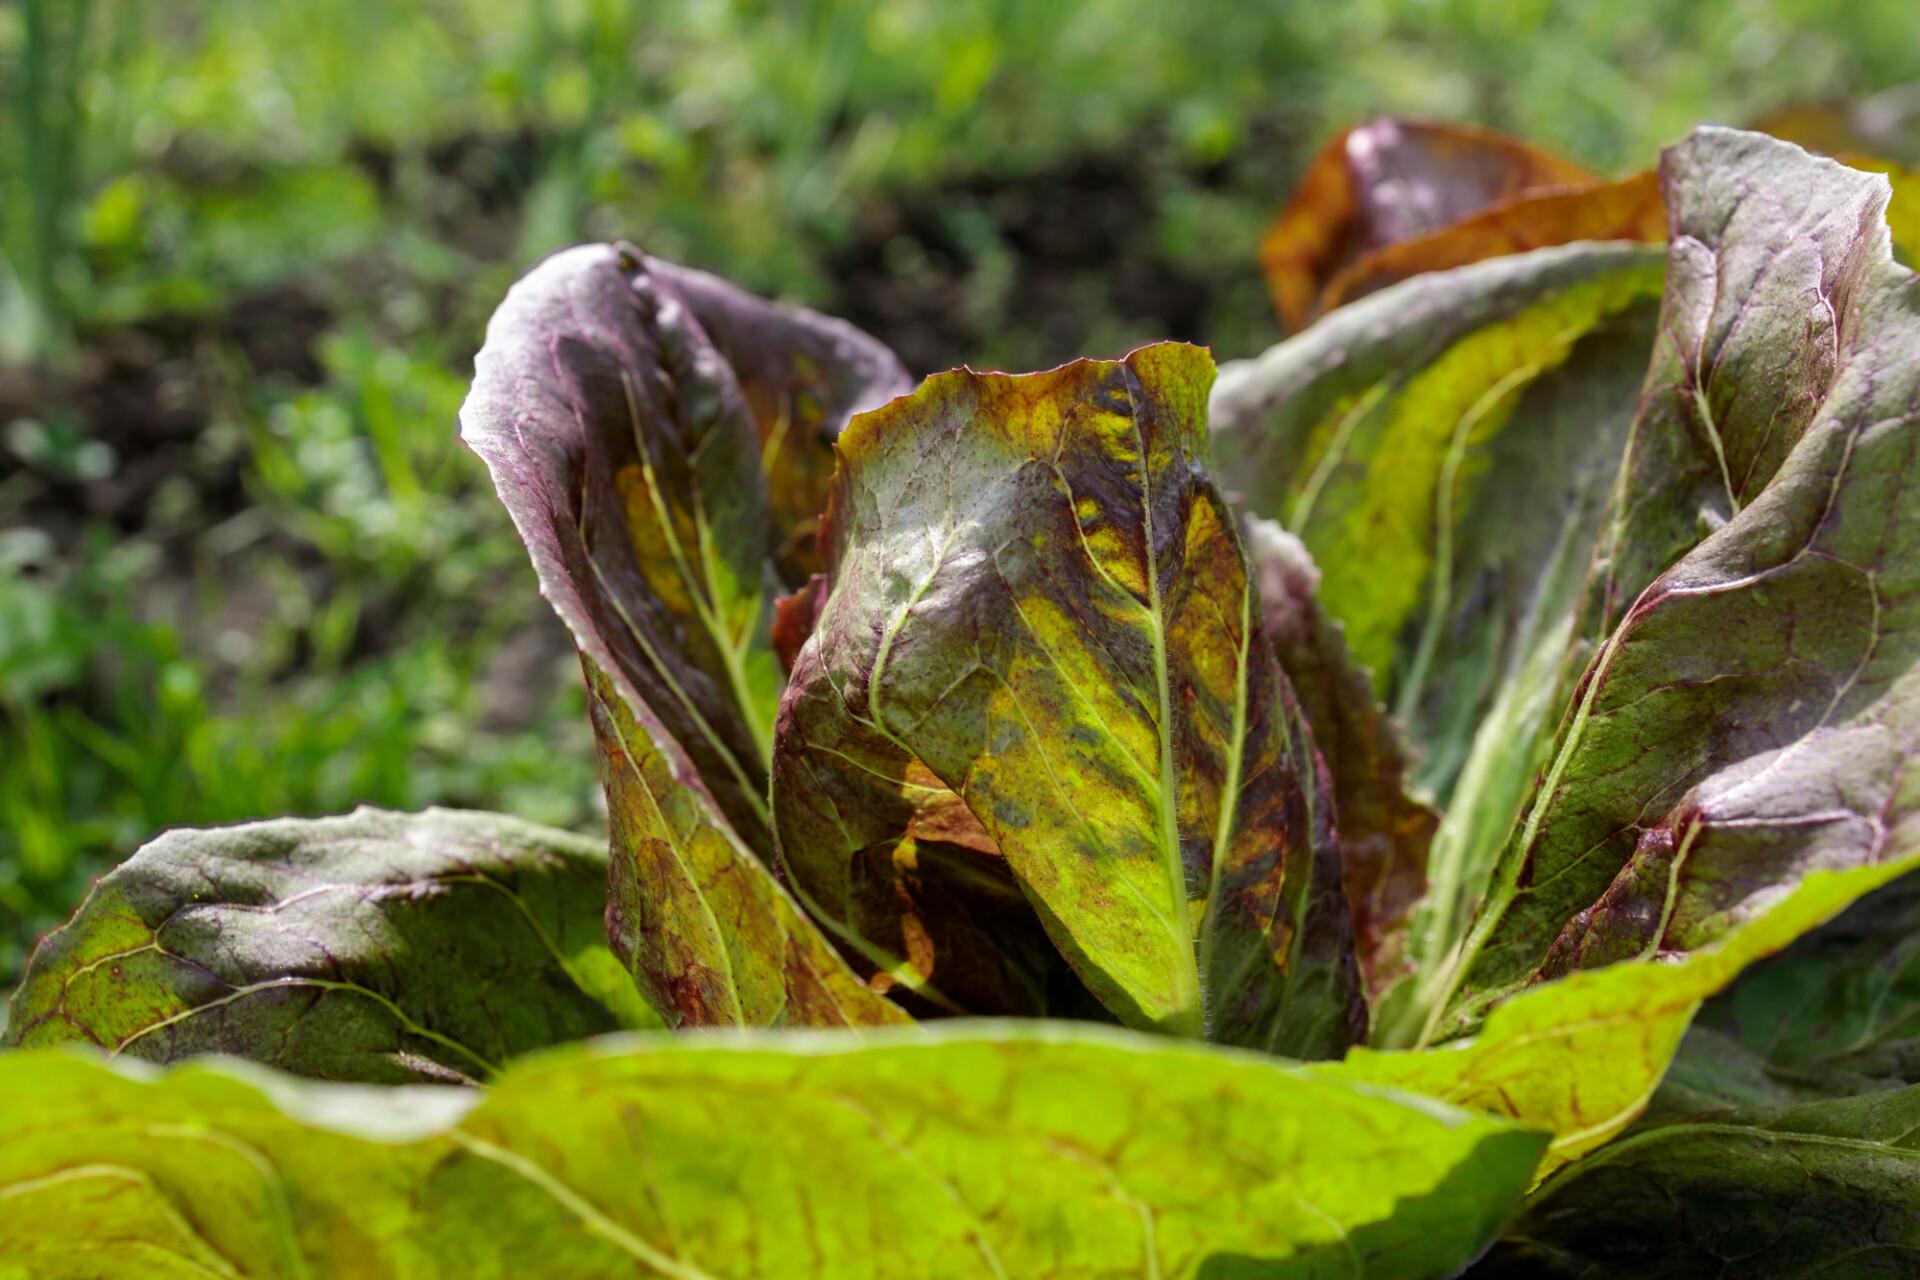 Salad grows in the garden